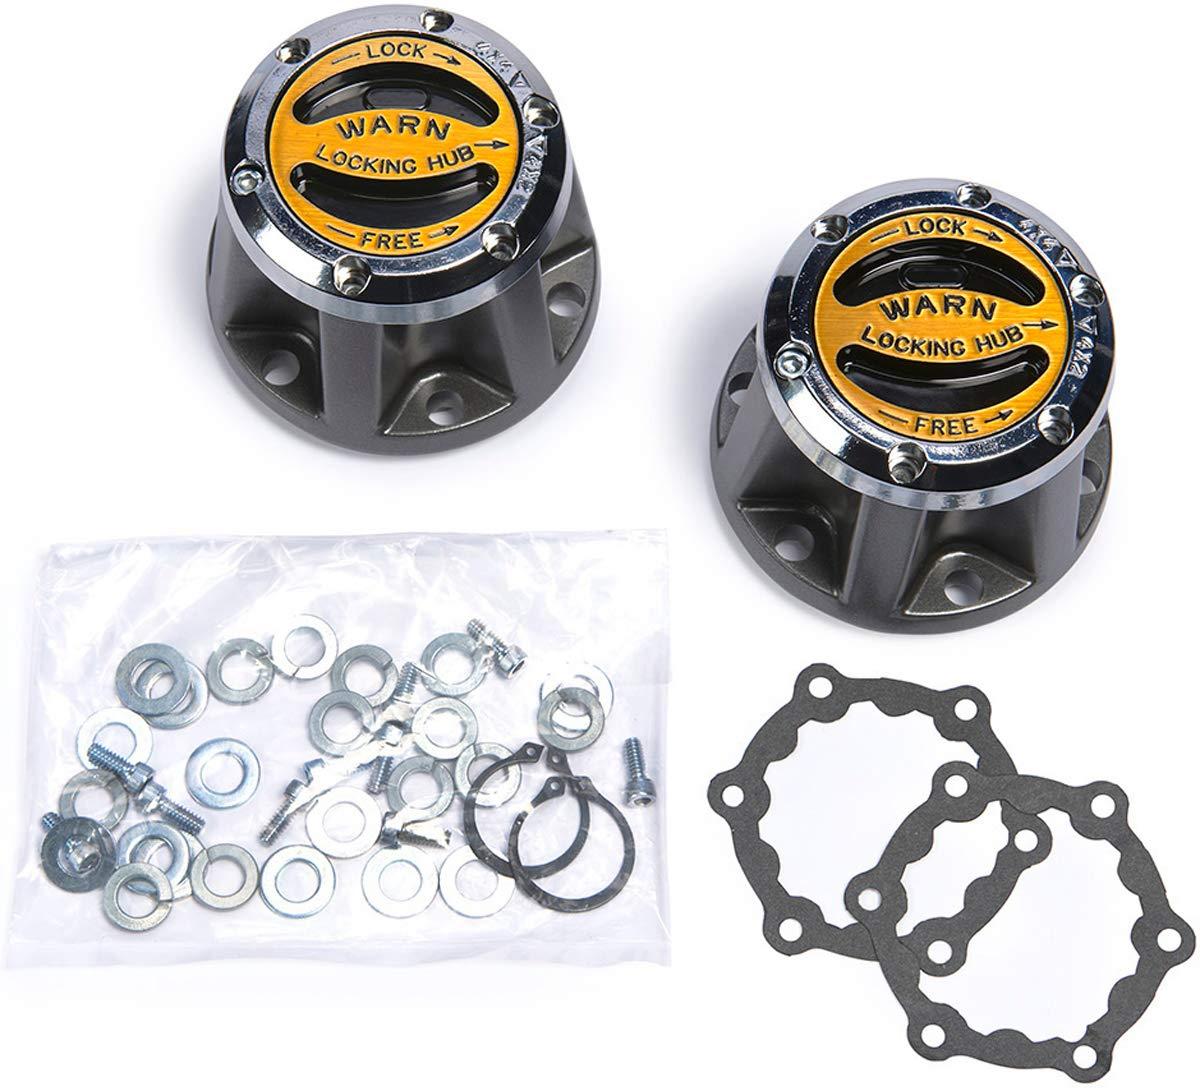 Warn 9062 Premium Manual Locking Hubs-27 Spline by WARN